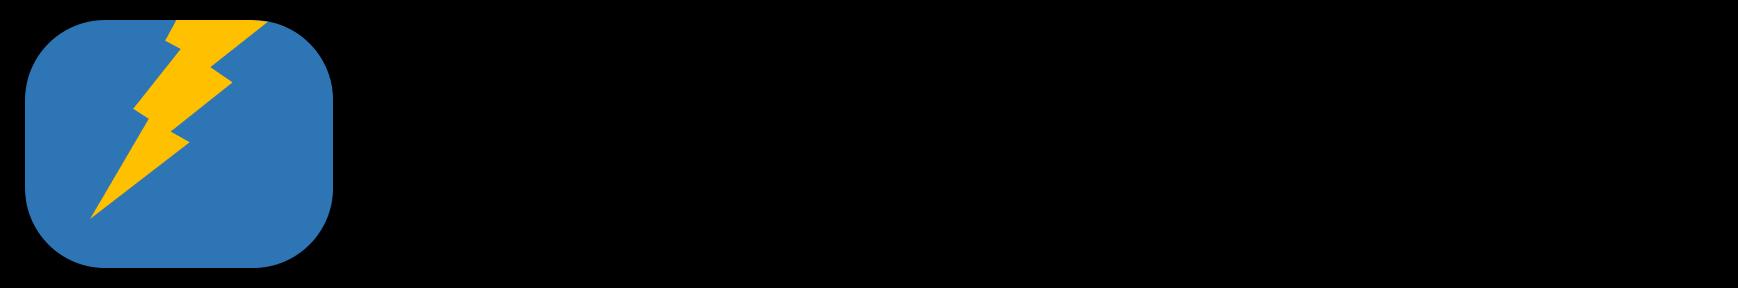 Chronostorm